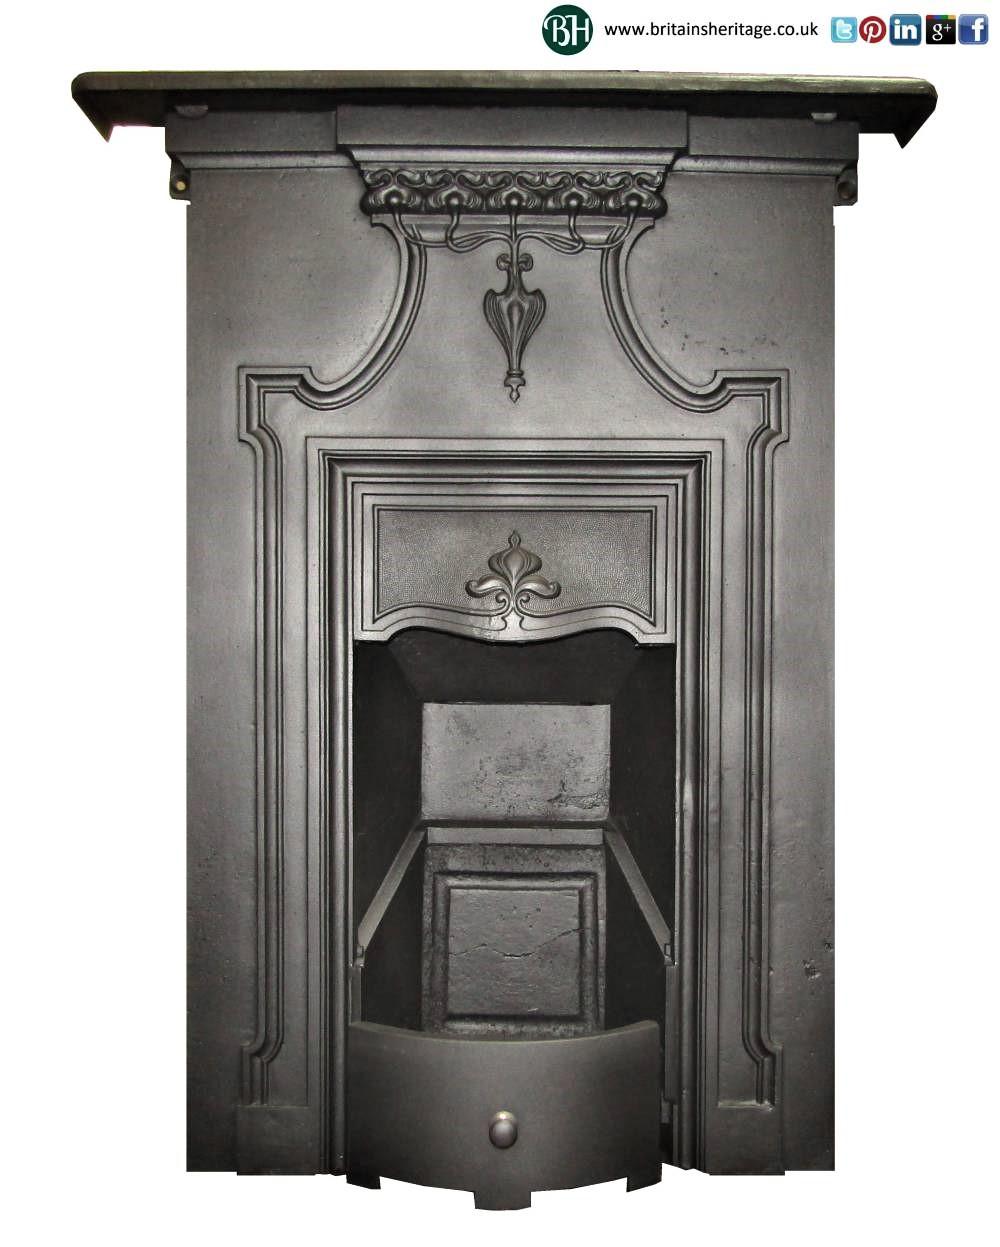 Antique Vintage Bedroom Fireplace: Buy Online: Art Nouveau Antique Bedroom Cast Iron Fireplace